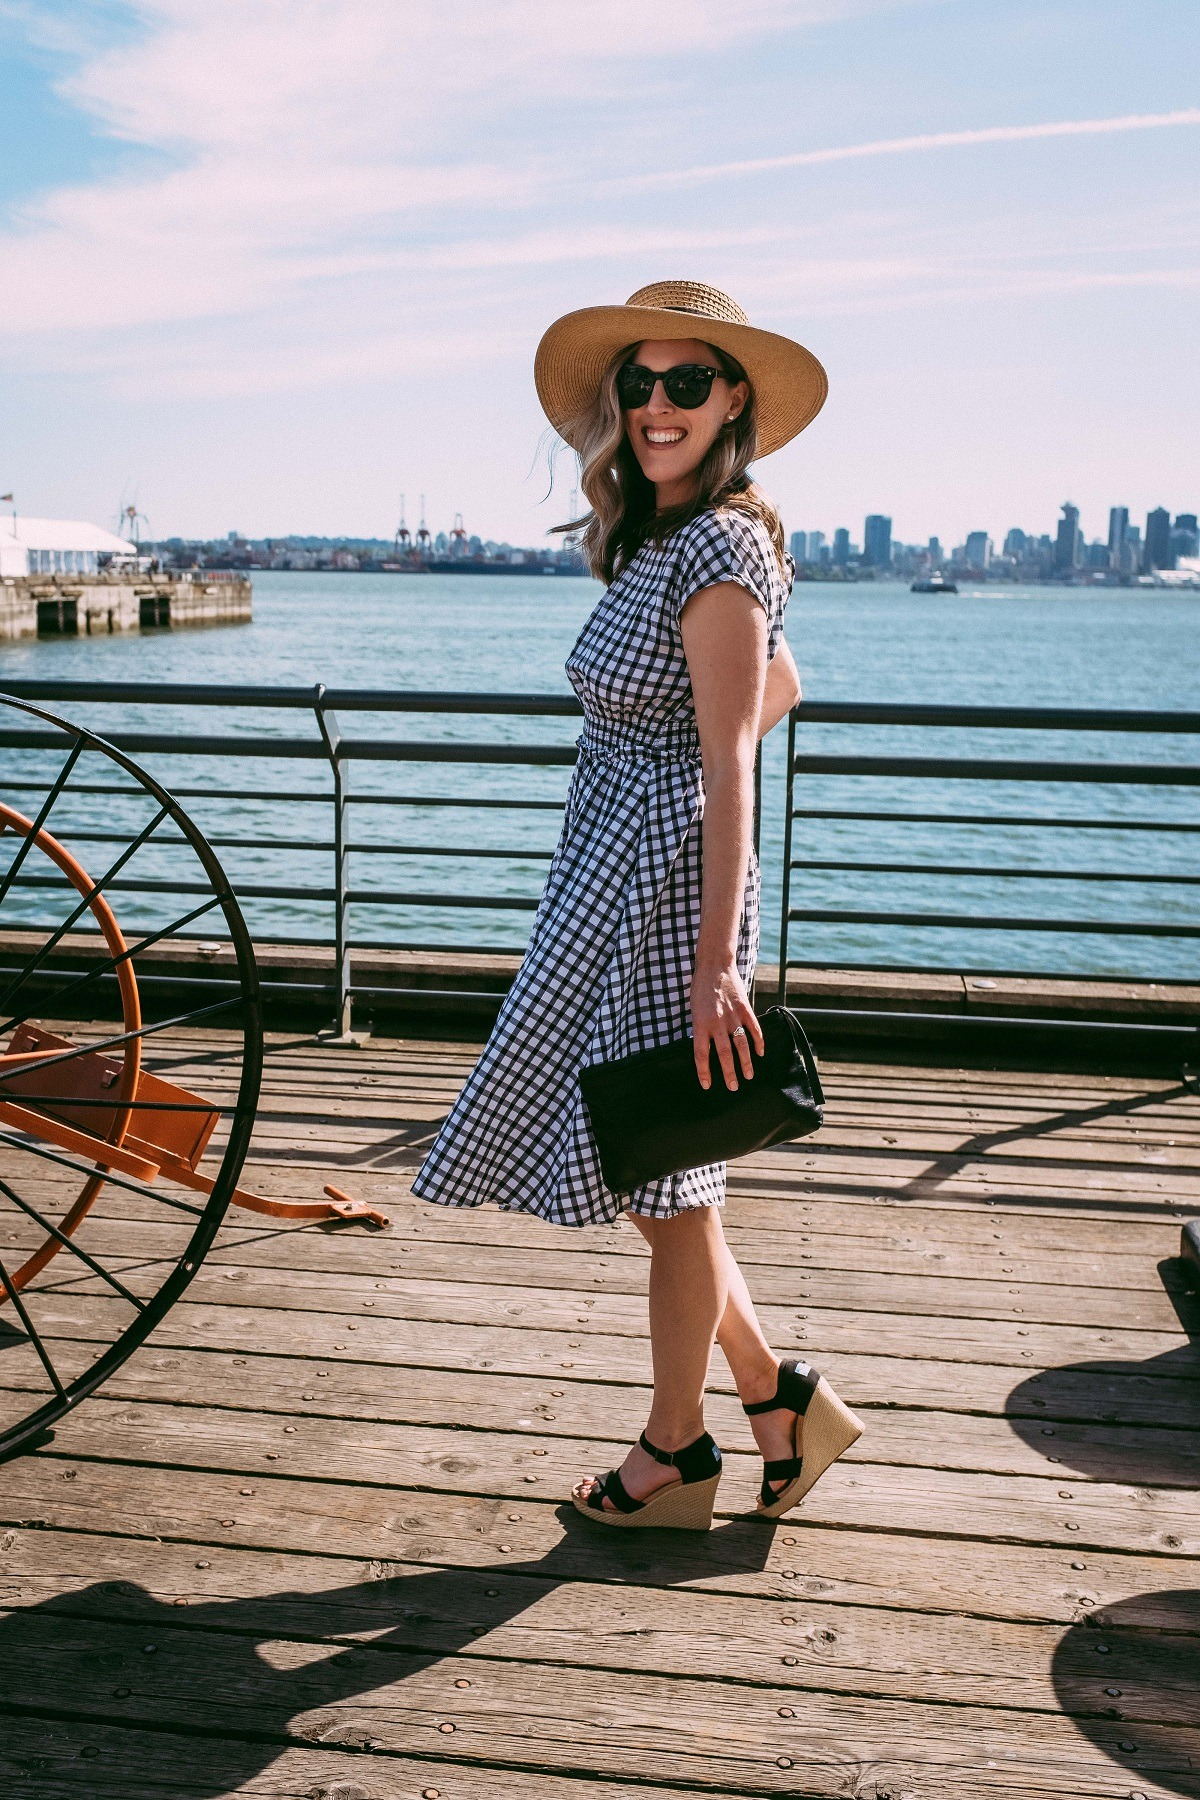 gingham dress, straw hat, espadrilles for summer